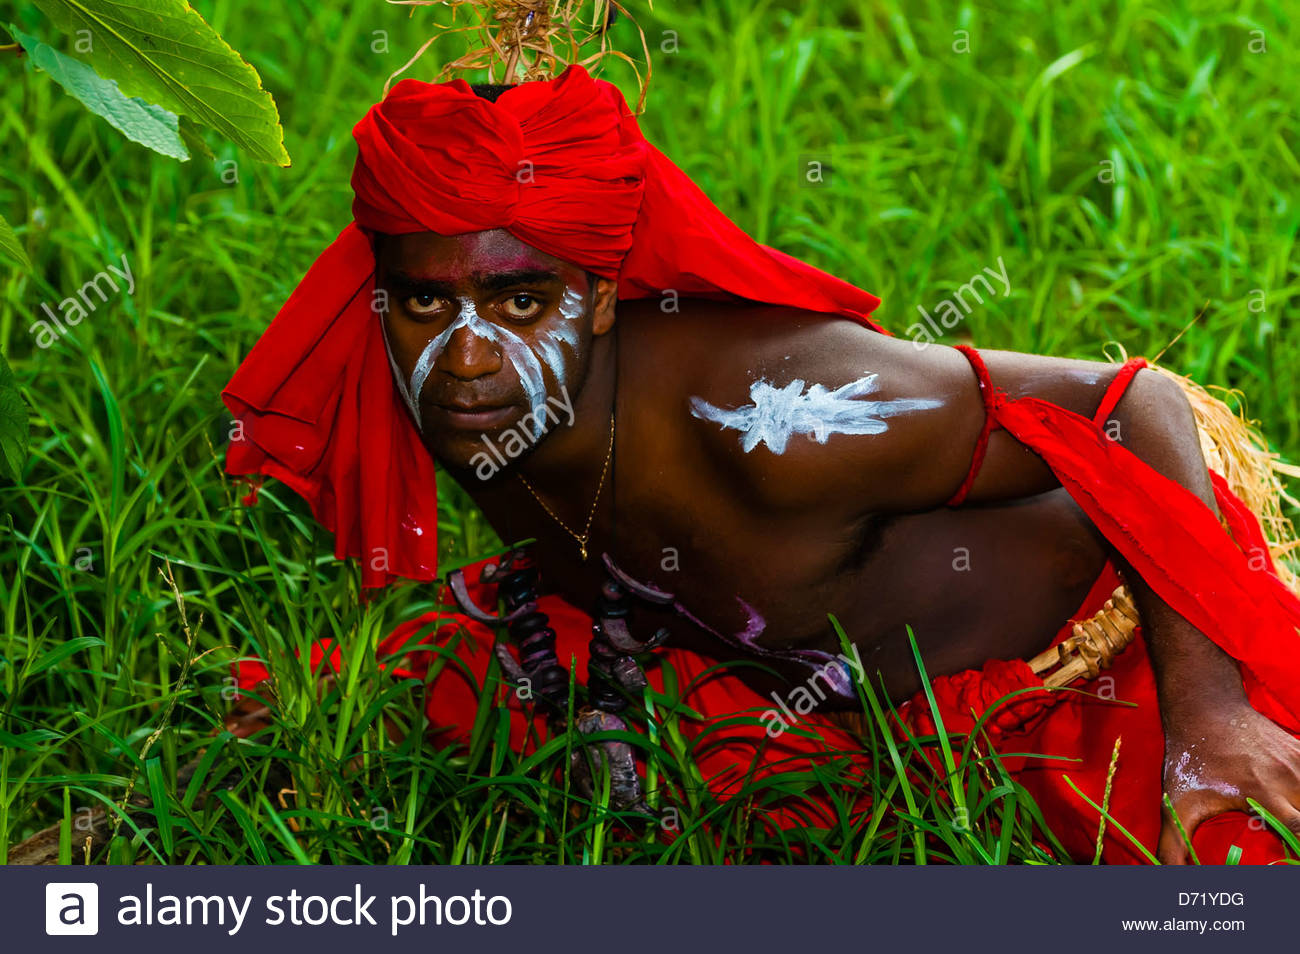 Wetr tribal dancers, Hnathalo, Lifou (island), Loyalty Islands, New Caledonia - Stock Image